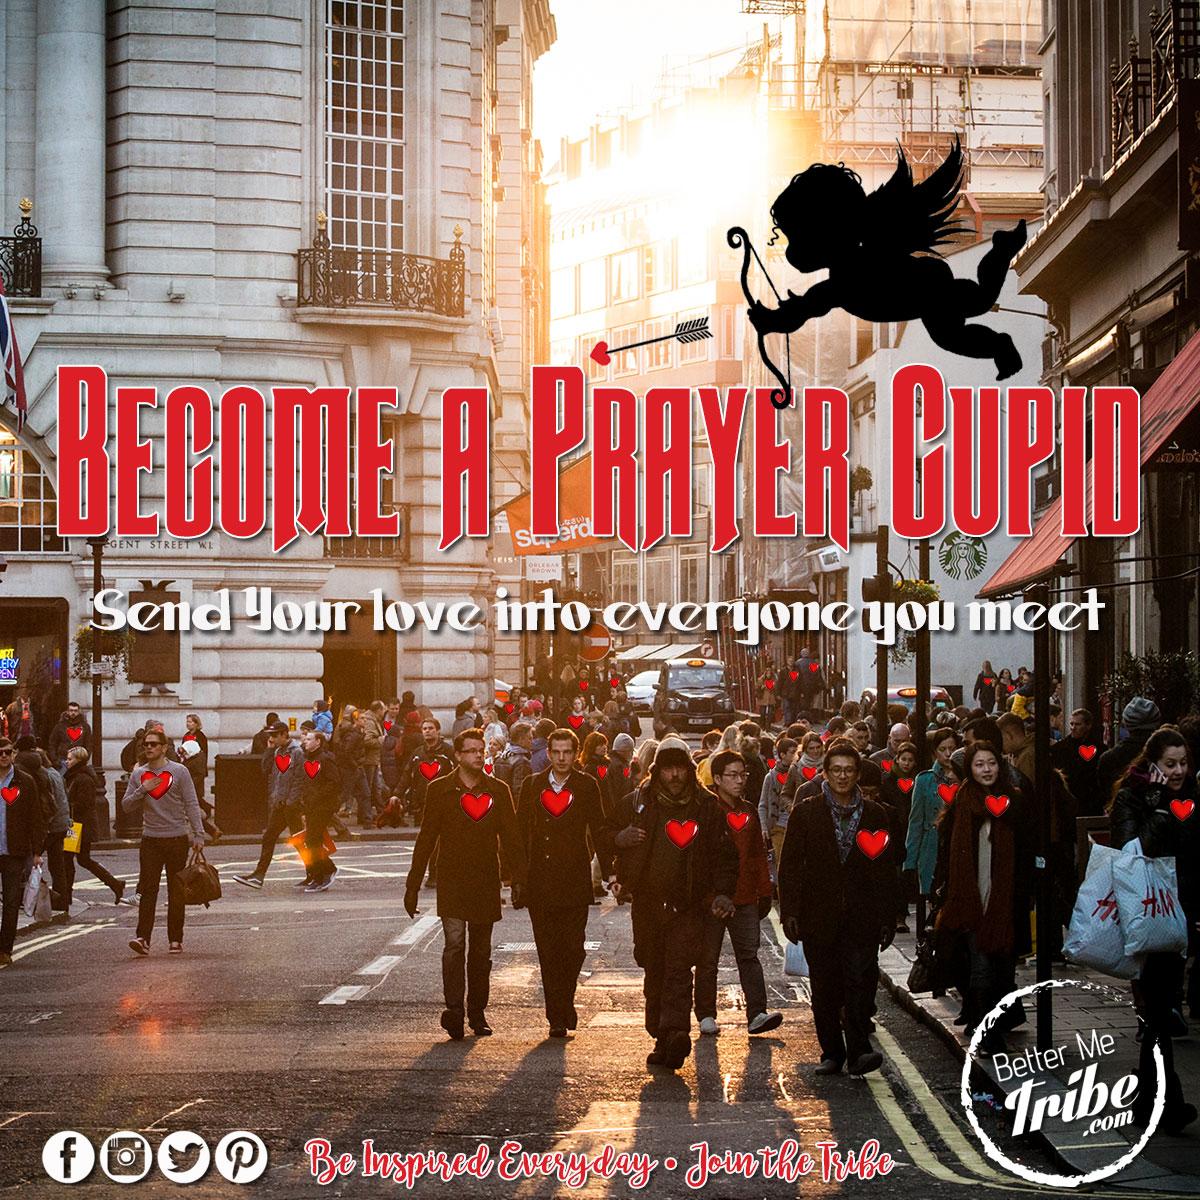 Prayer-Cupid-Web